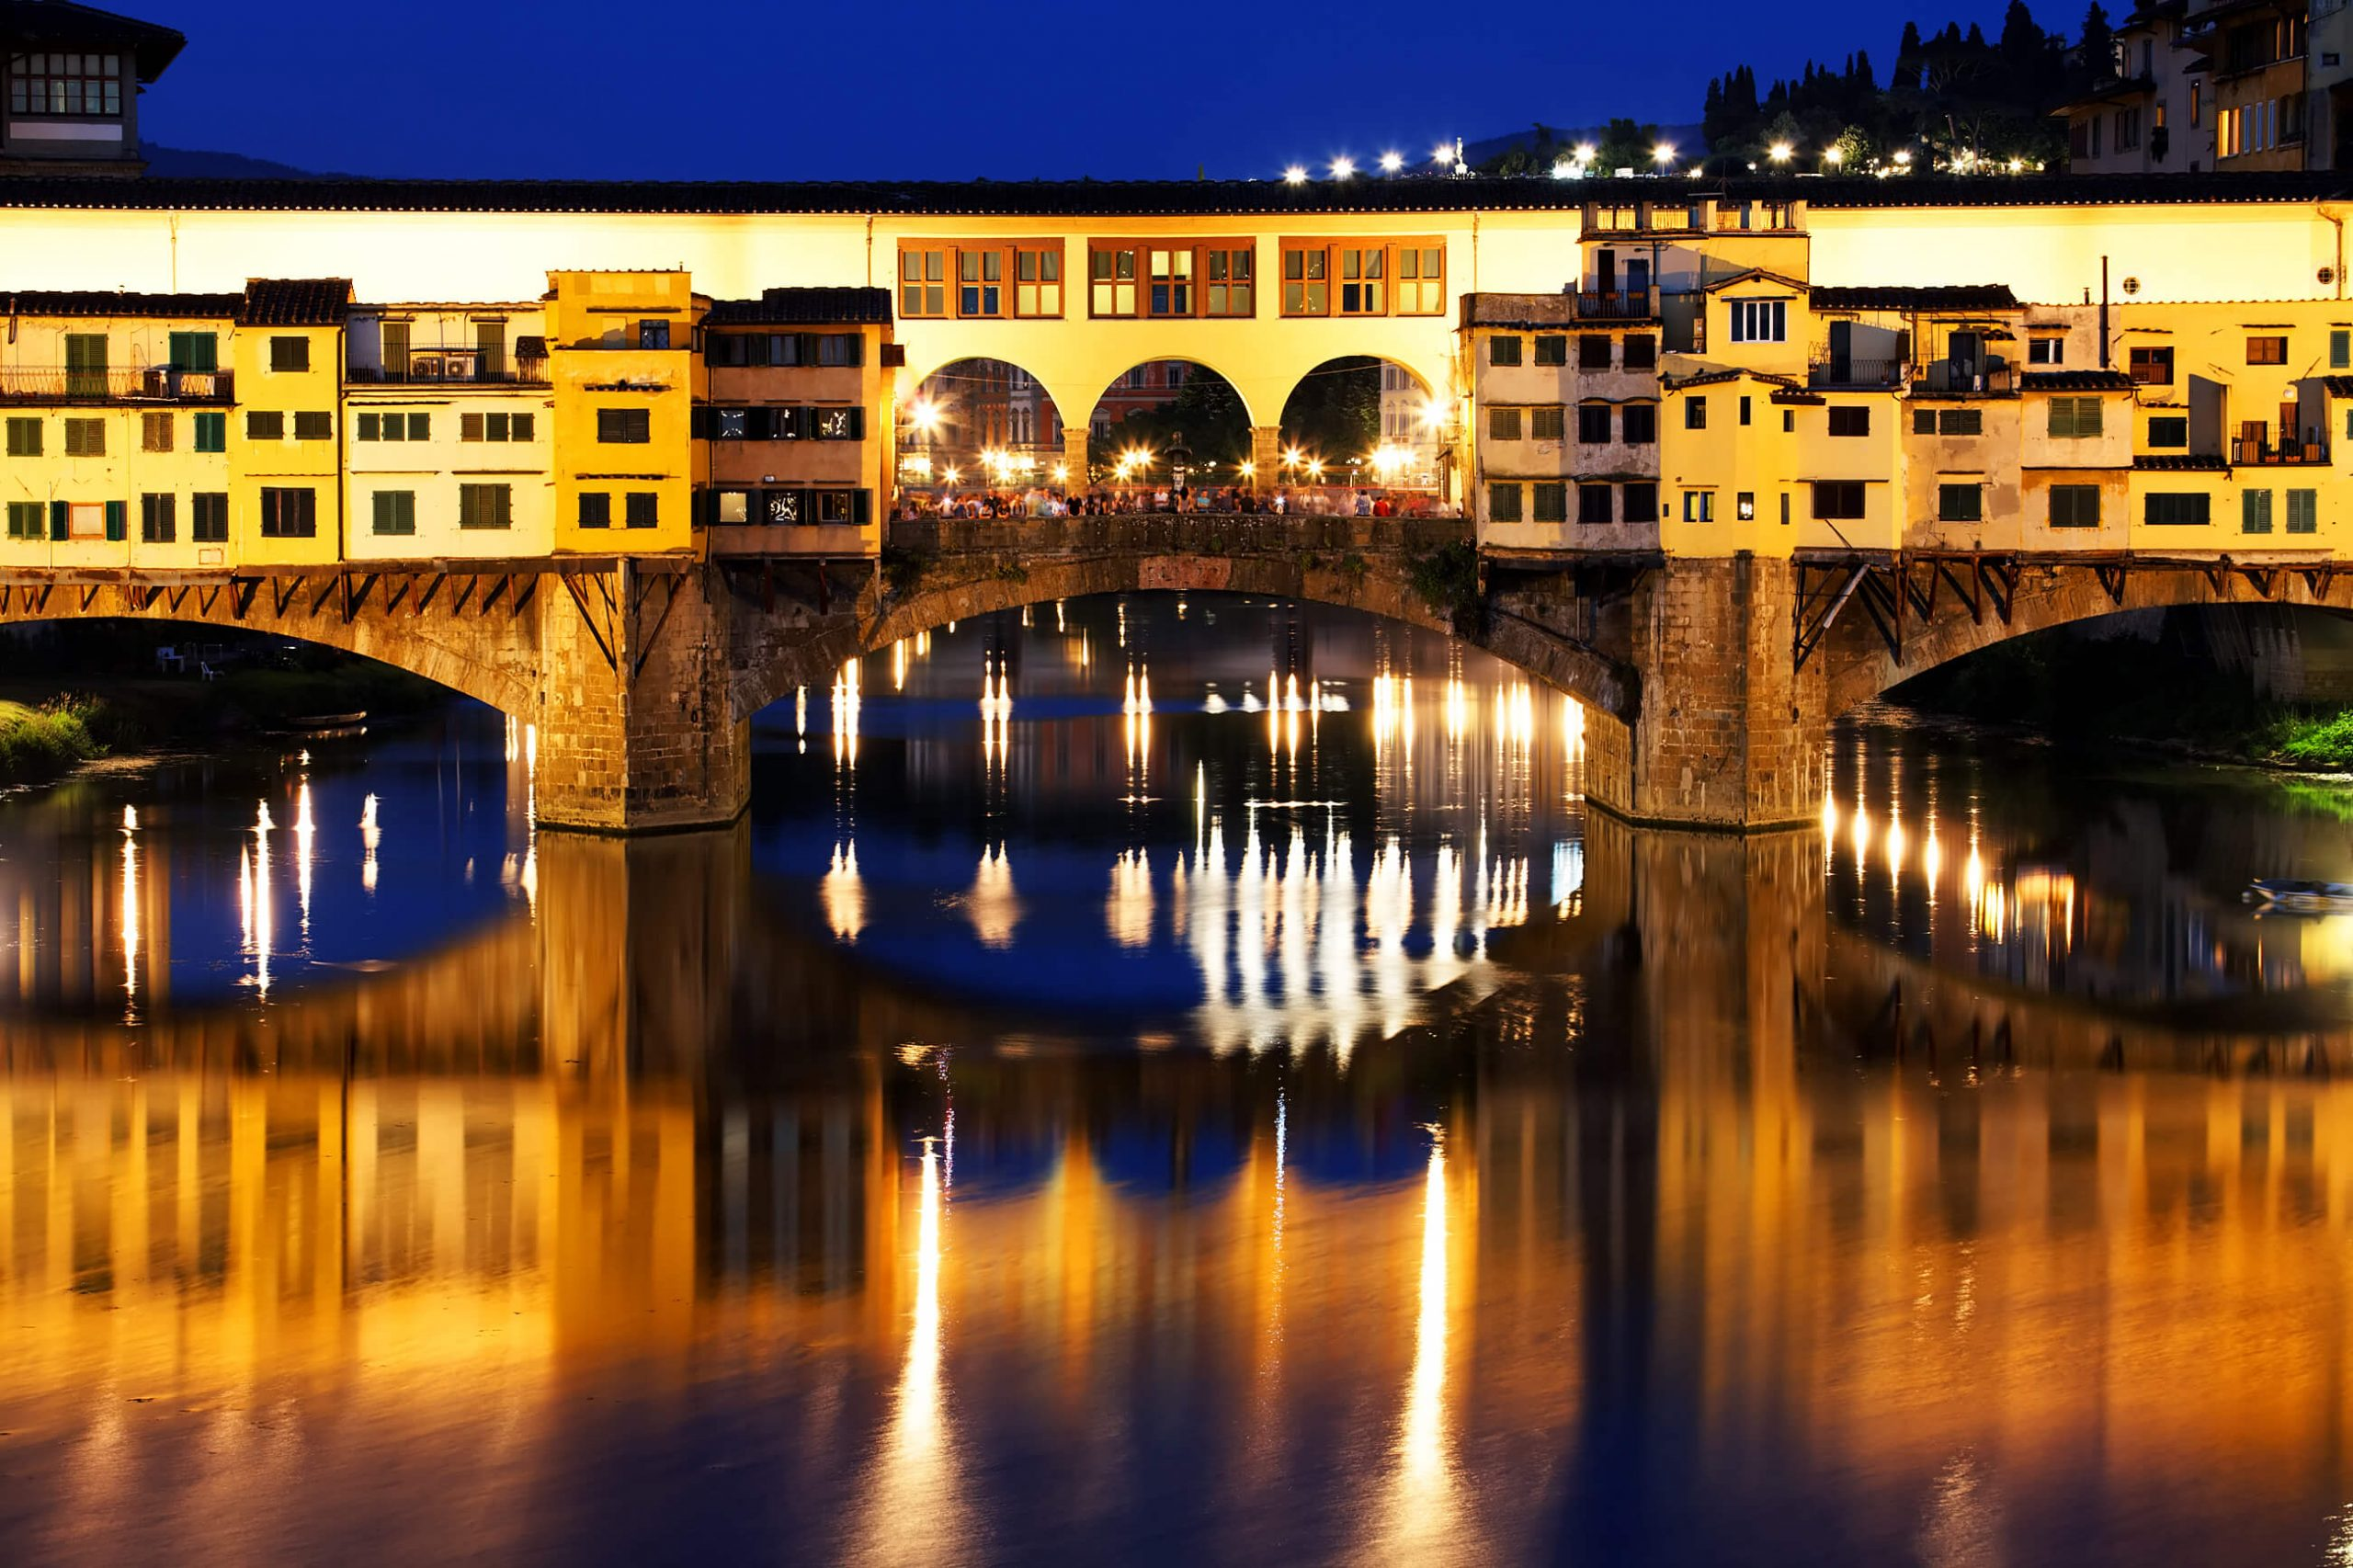 Ponte Vecchio large